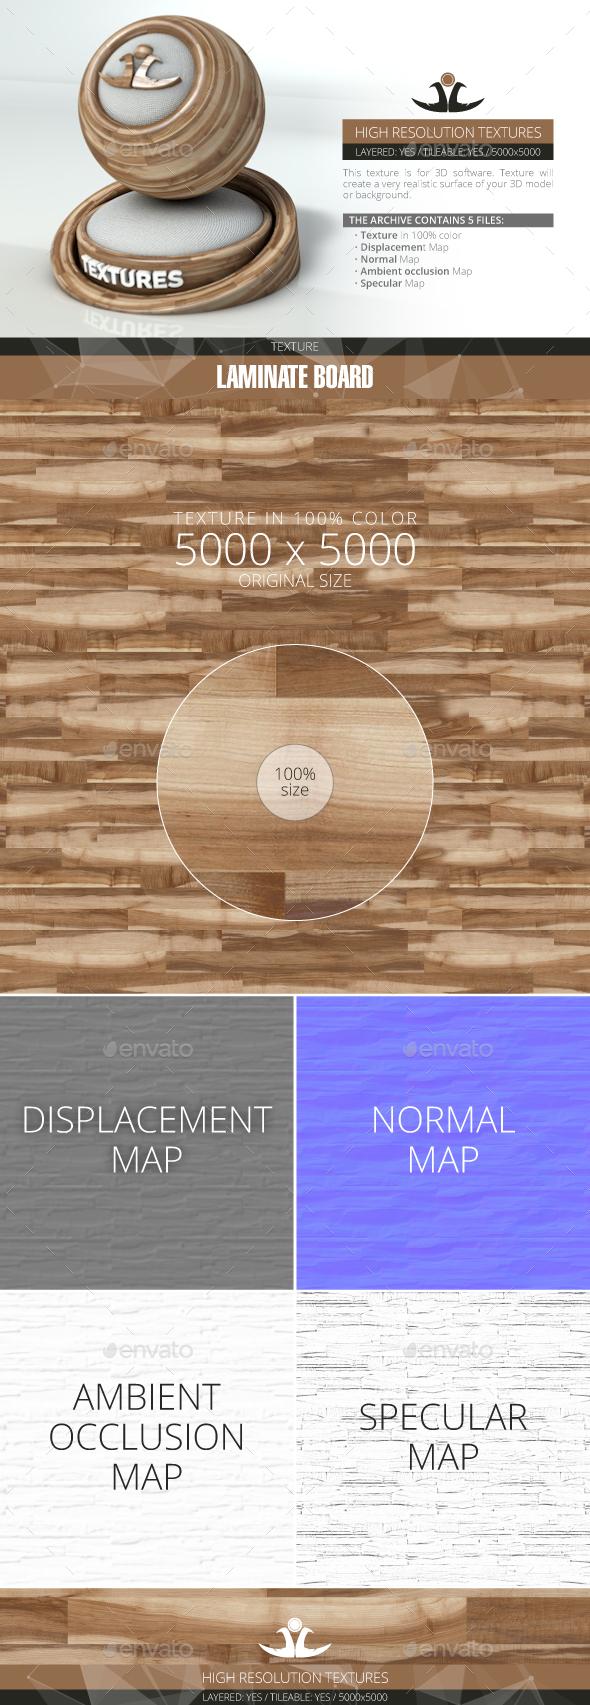 Laminate Board 76 - 3DOcean Item for Sale